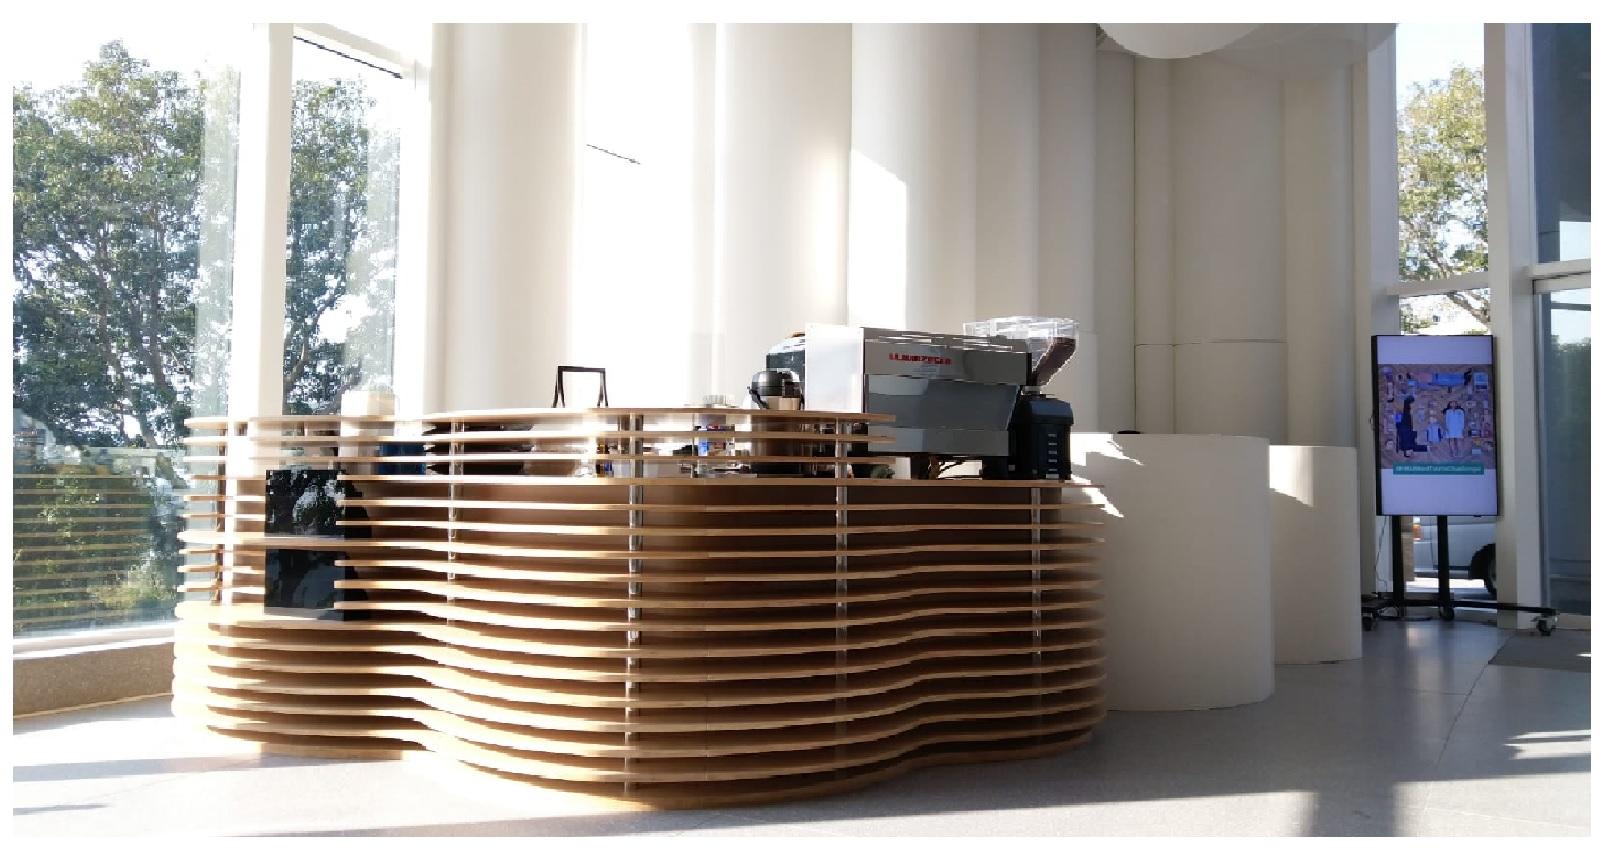 Faculty of Medicine Building Coffee Kiosk